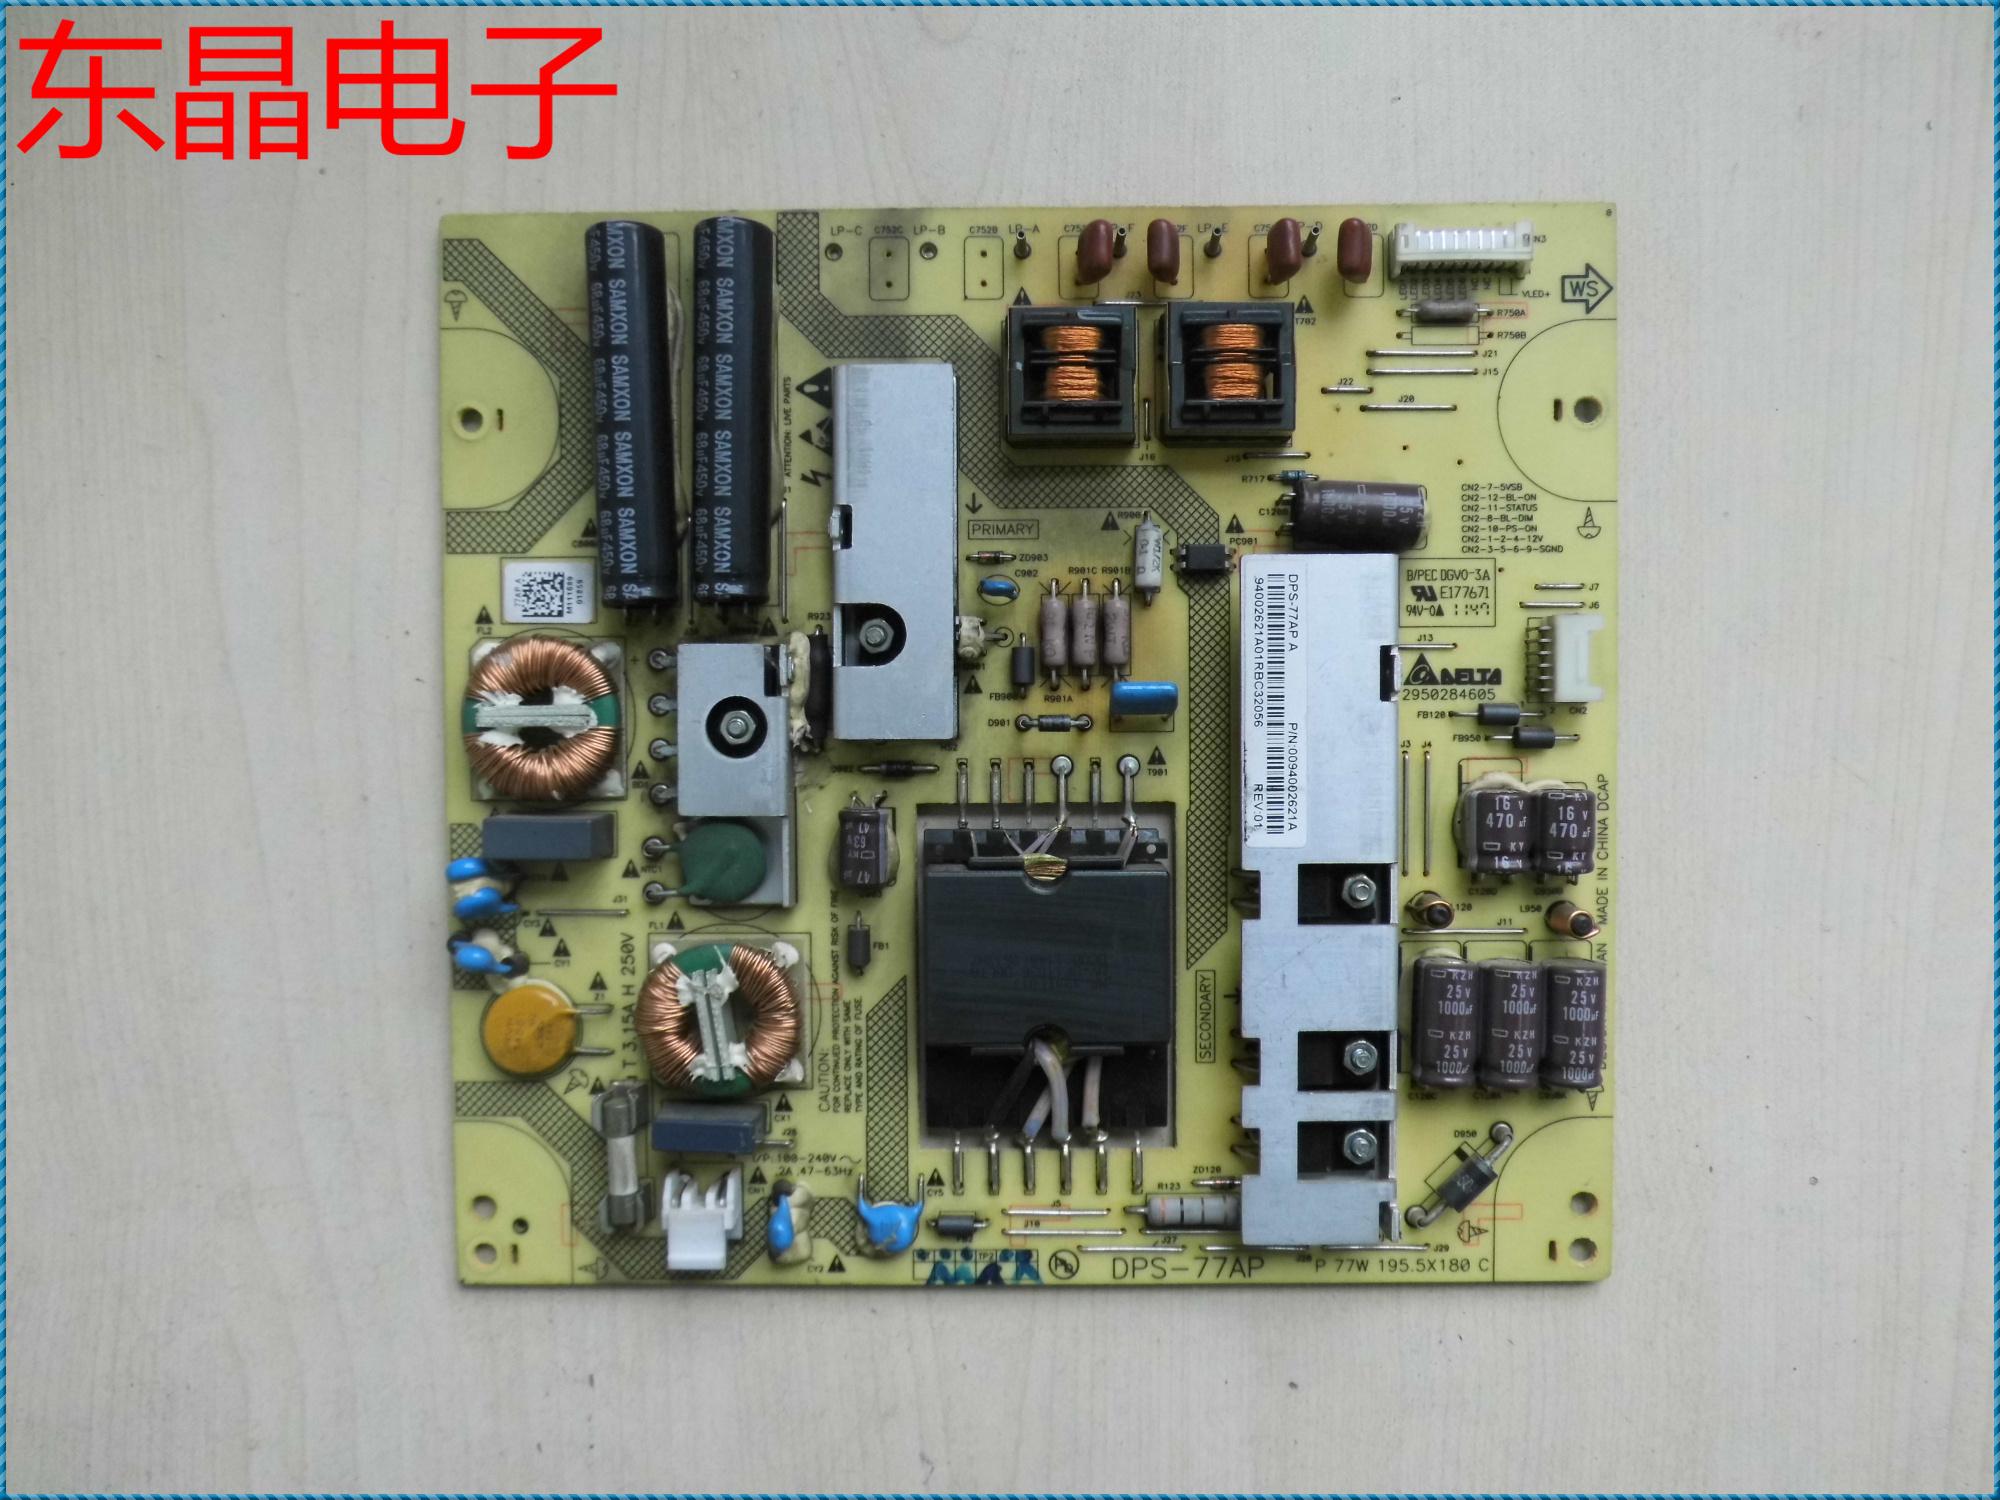 TP VST59S PB怎么样tp vst59s pb813主板哪款好